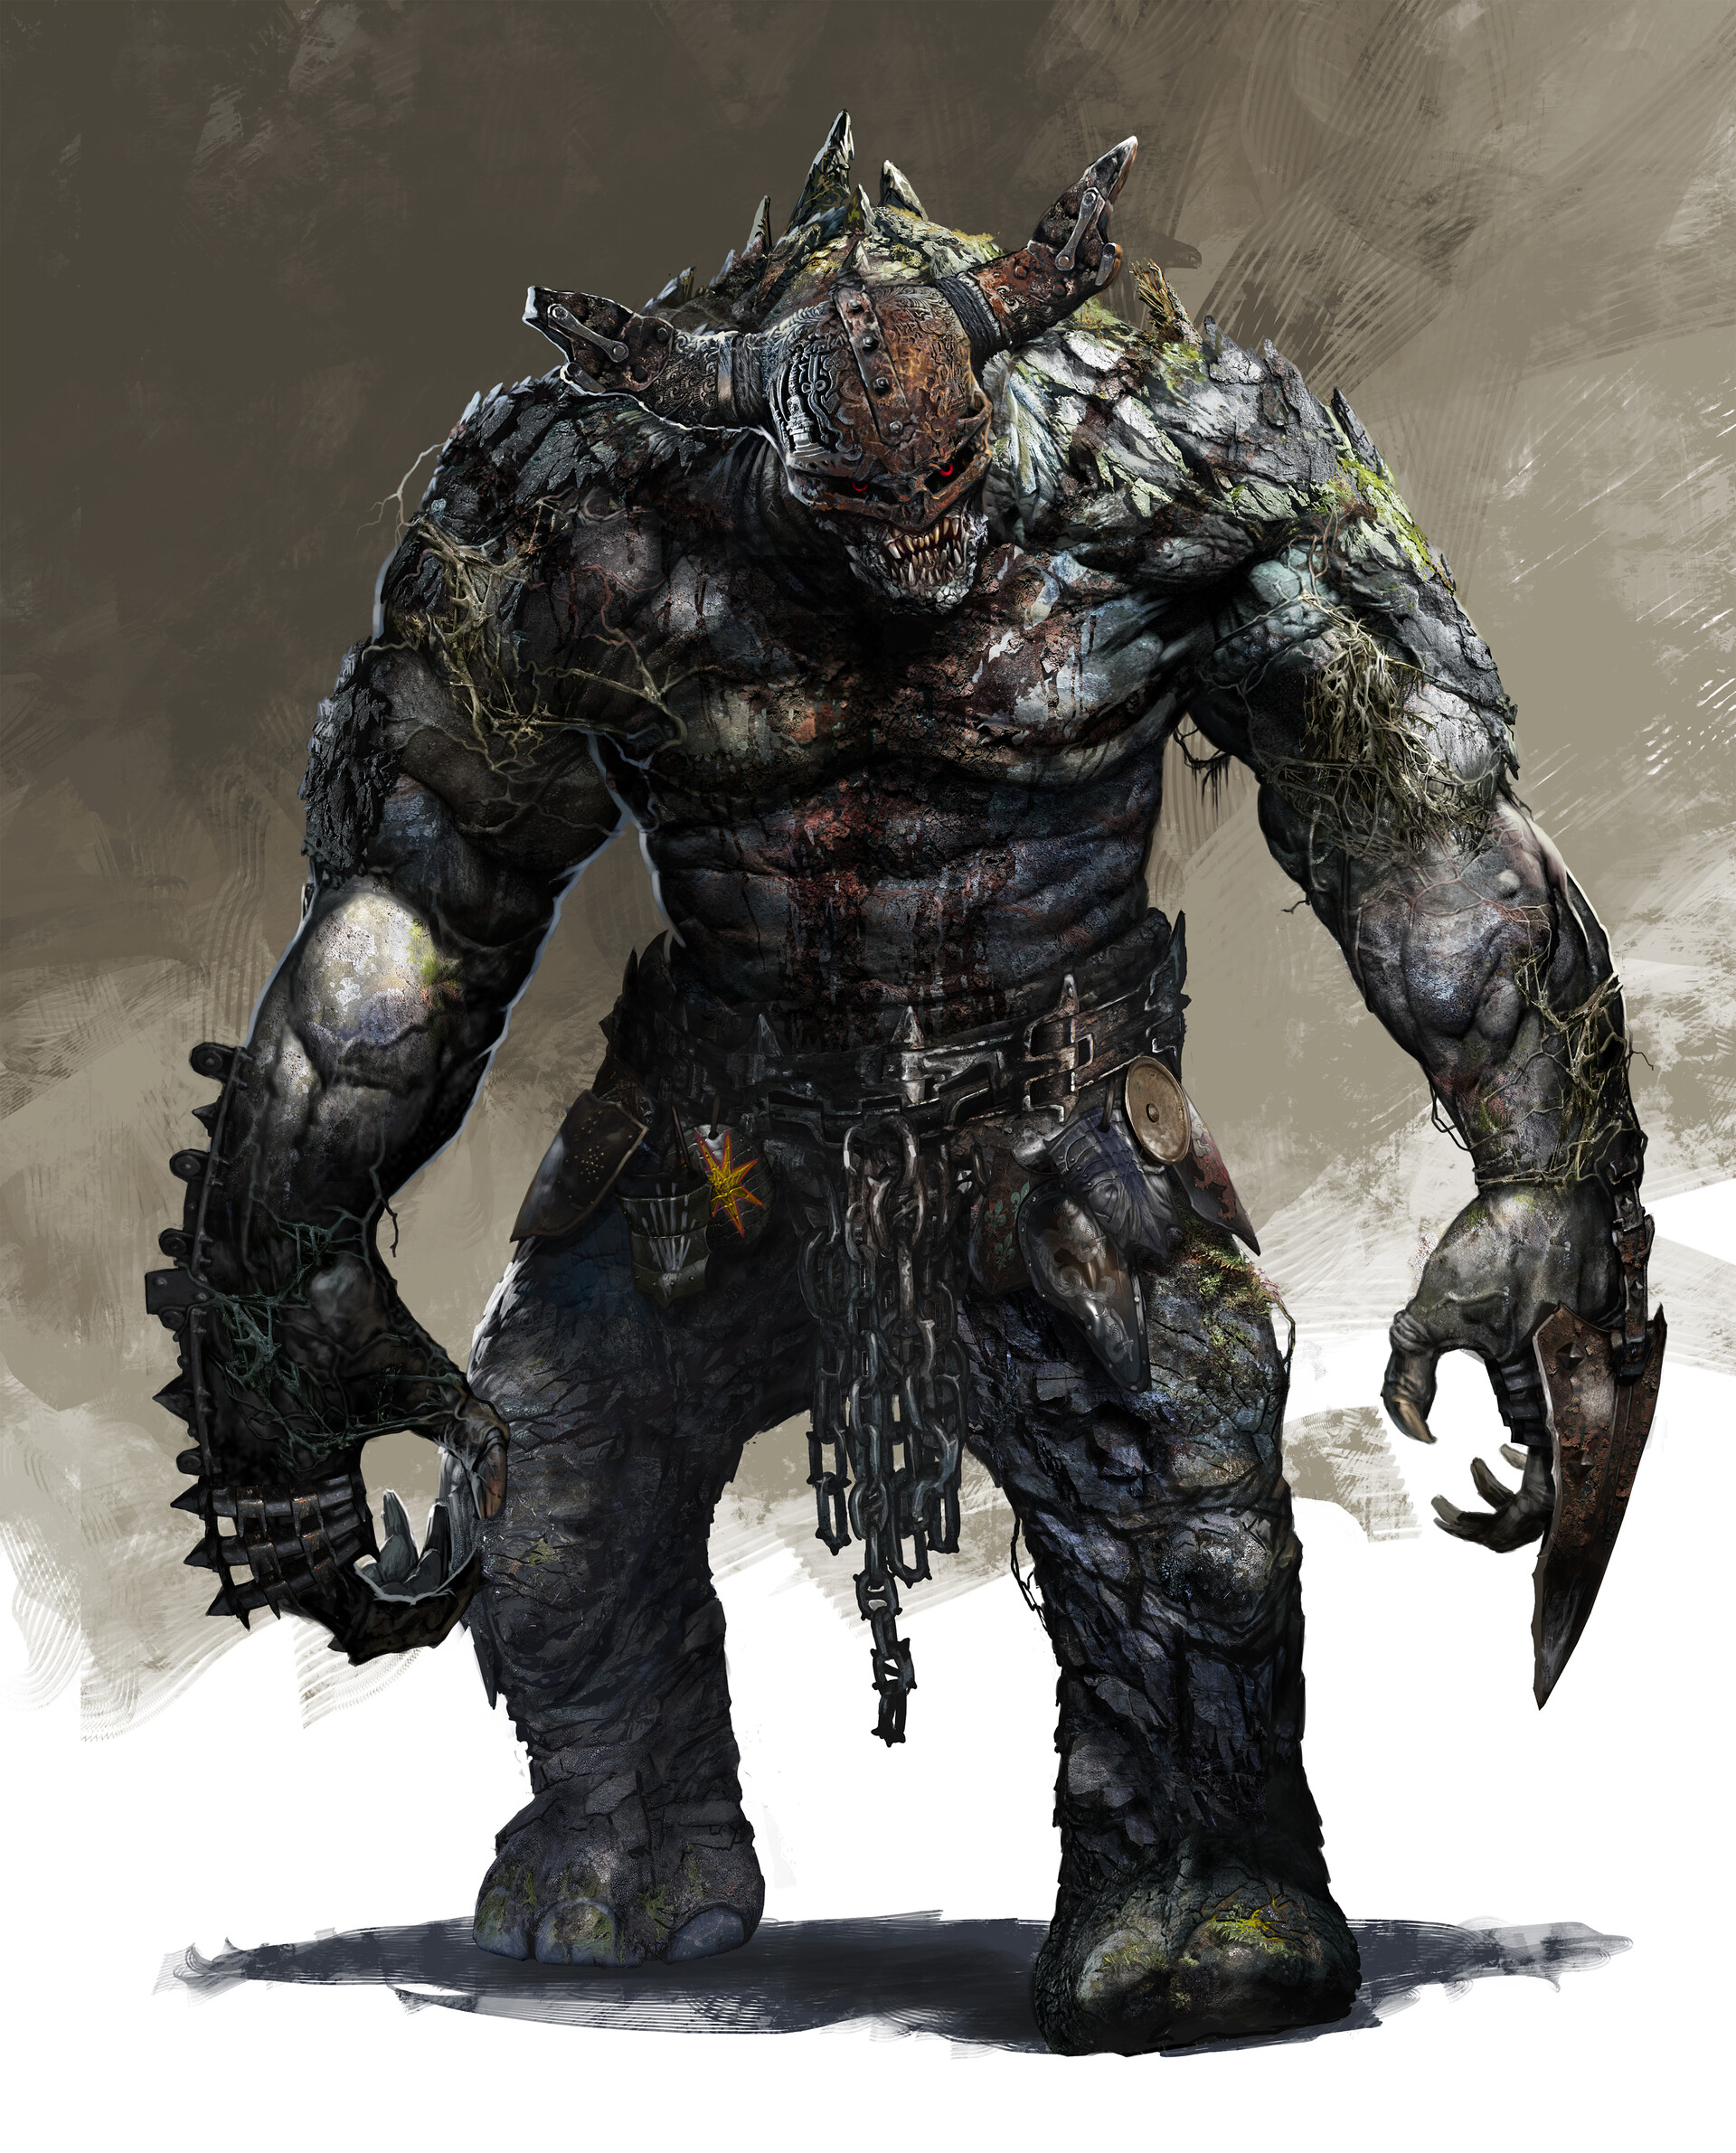 Jakub kuzma stone troll 2s